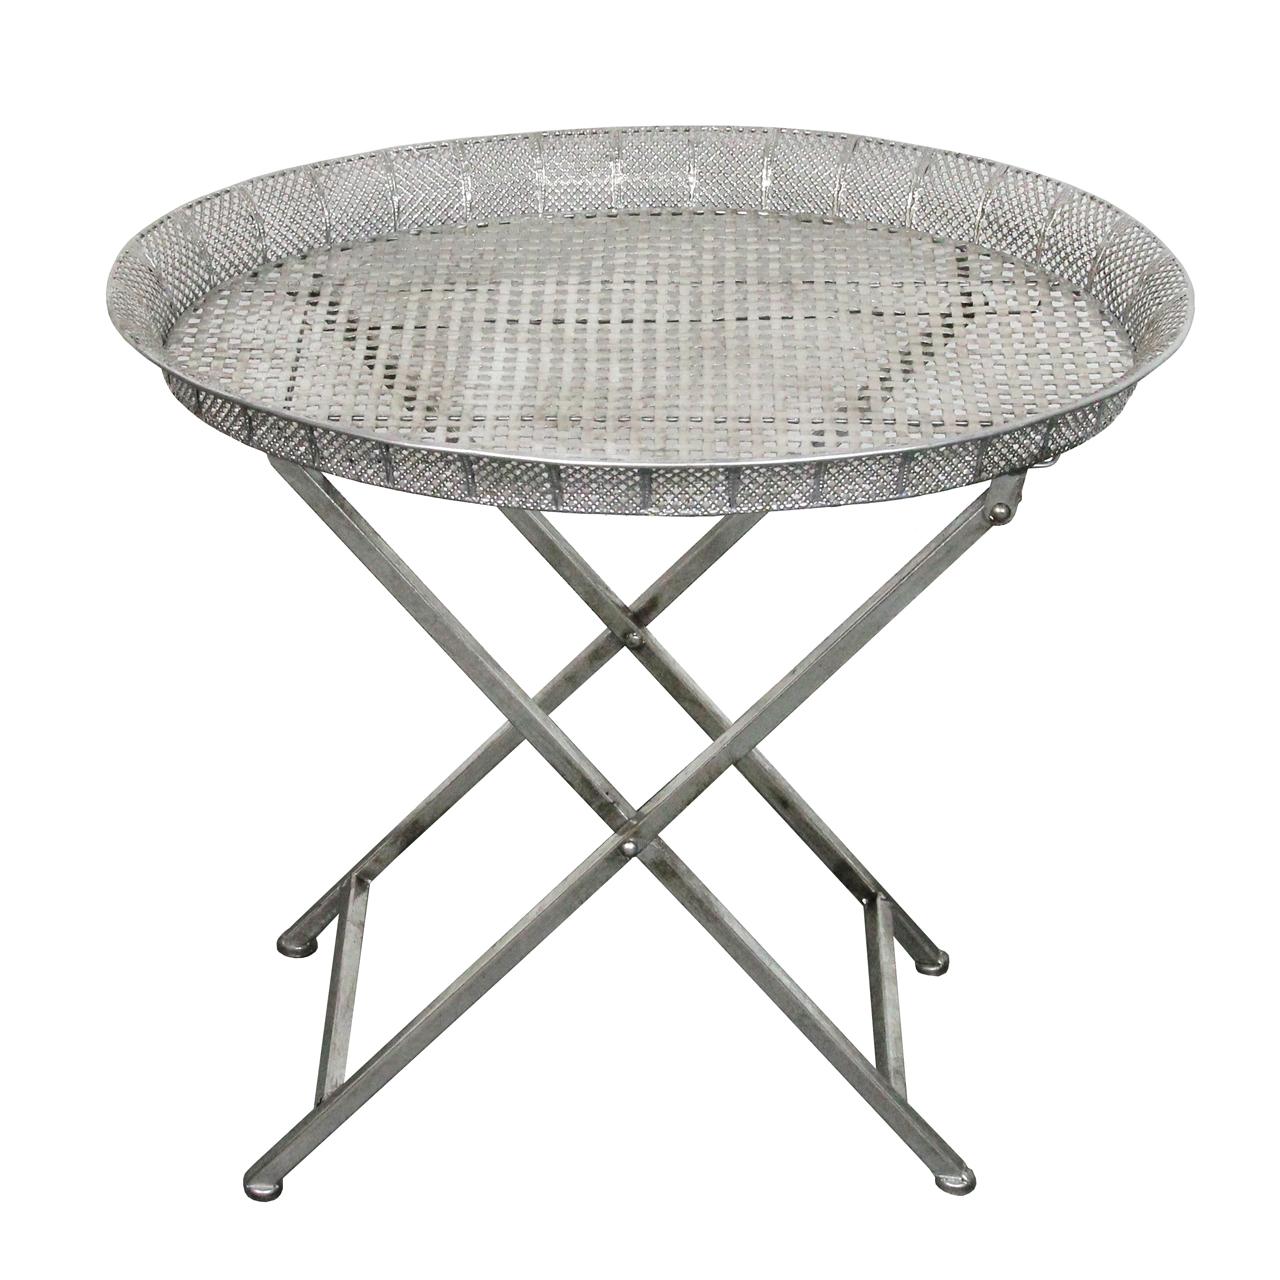 Masa Orina Din Metal Argintiu 57x44x50 Cm